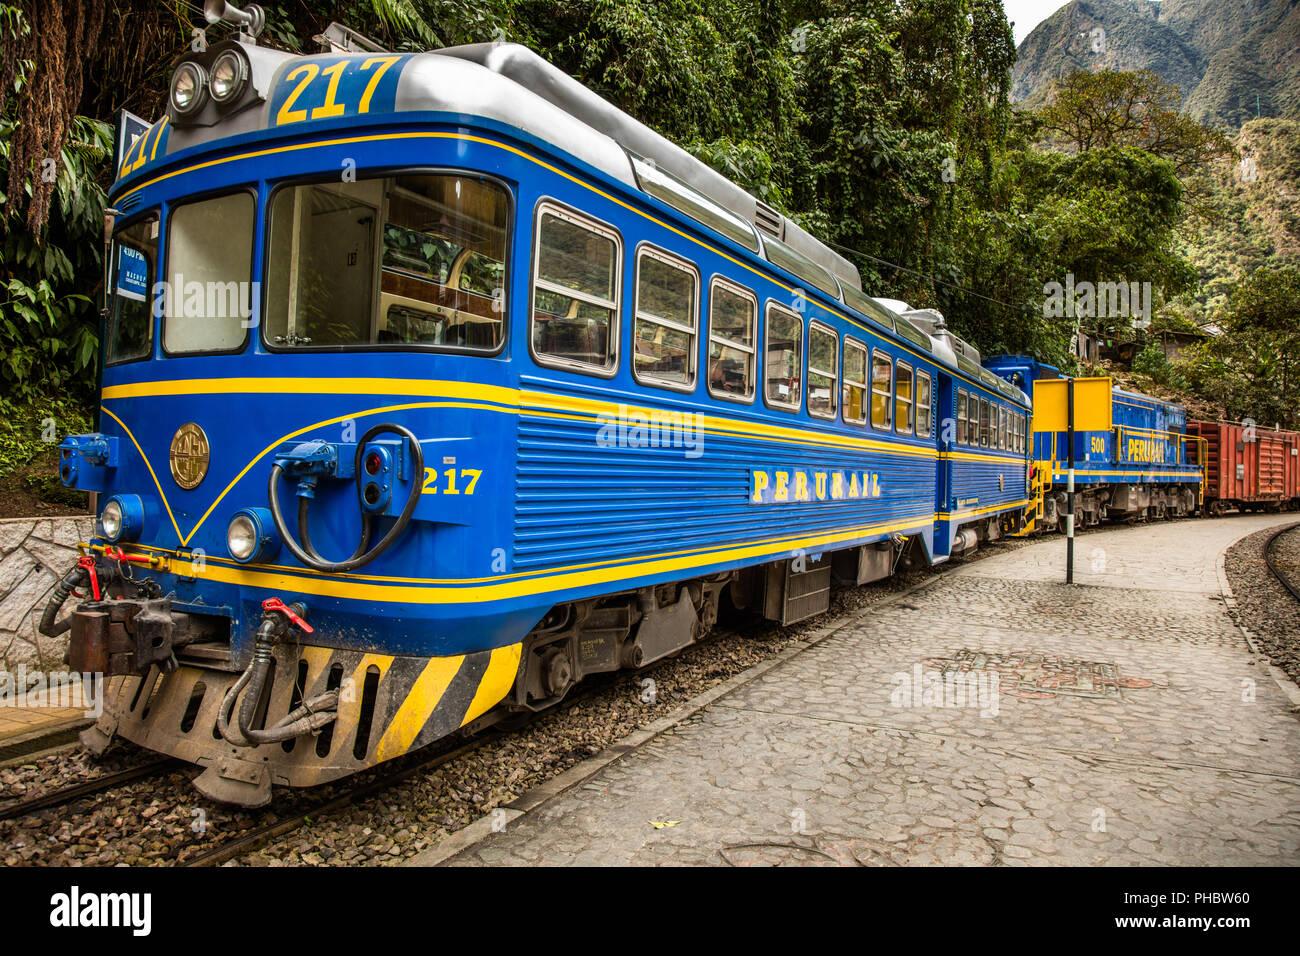 Perurail's Skydome tourist train car in Agua Calientes, transporting passengers from Cusco to Machu Picchu Pueblo (Agua Calientes), and beyond. Peru. - Stock Image